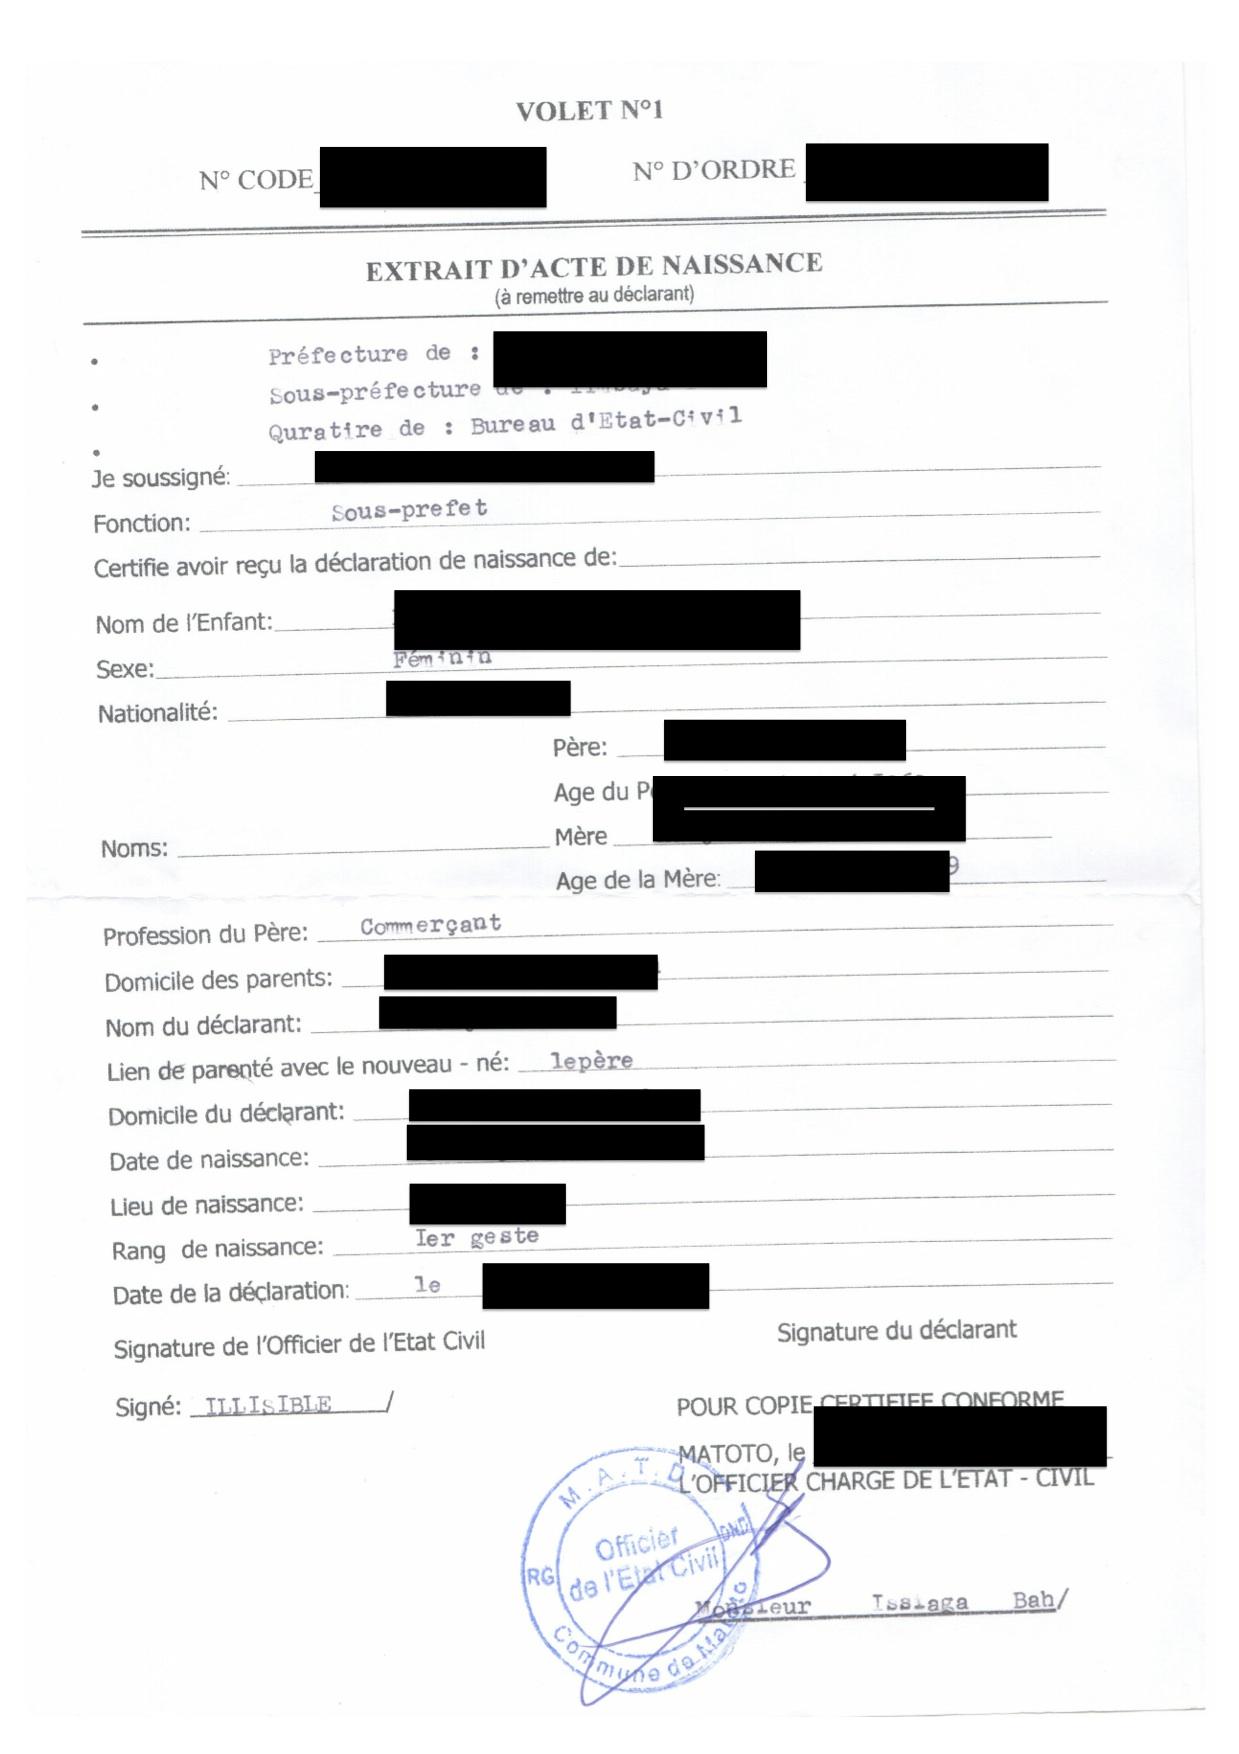 Guinea Birth Certificate Translation London Translation And